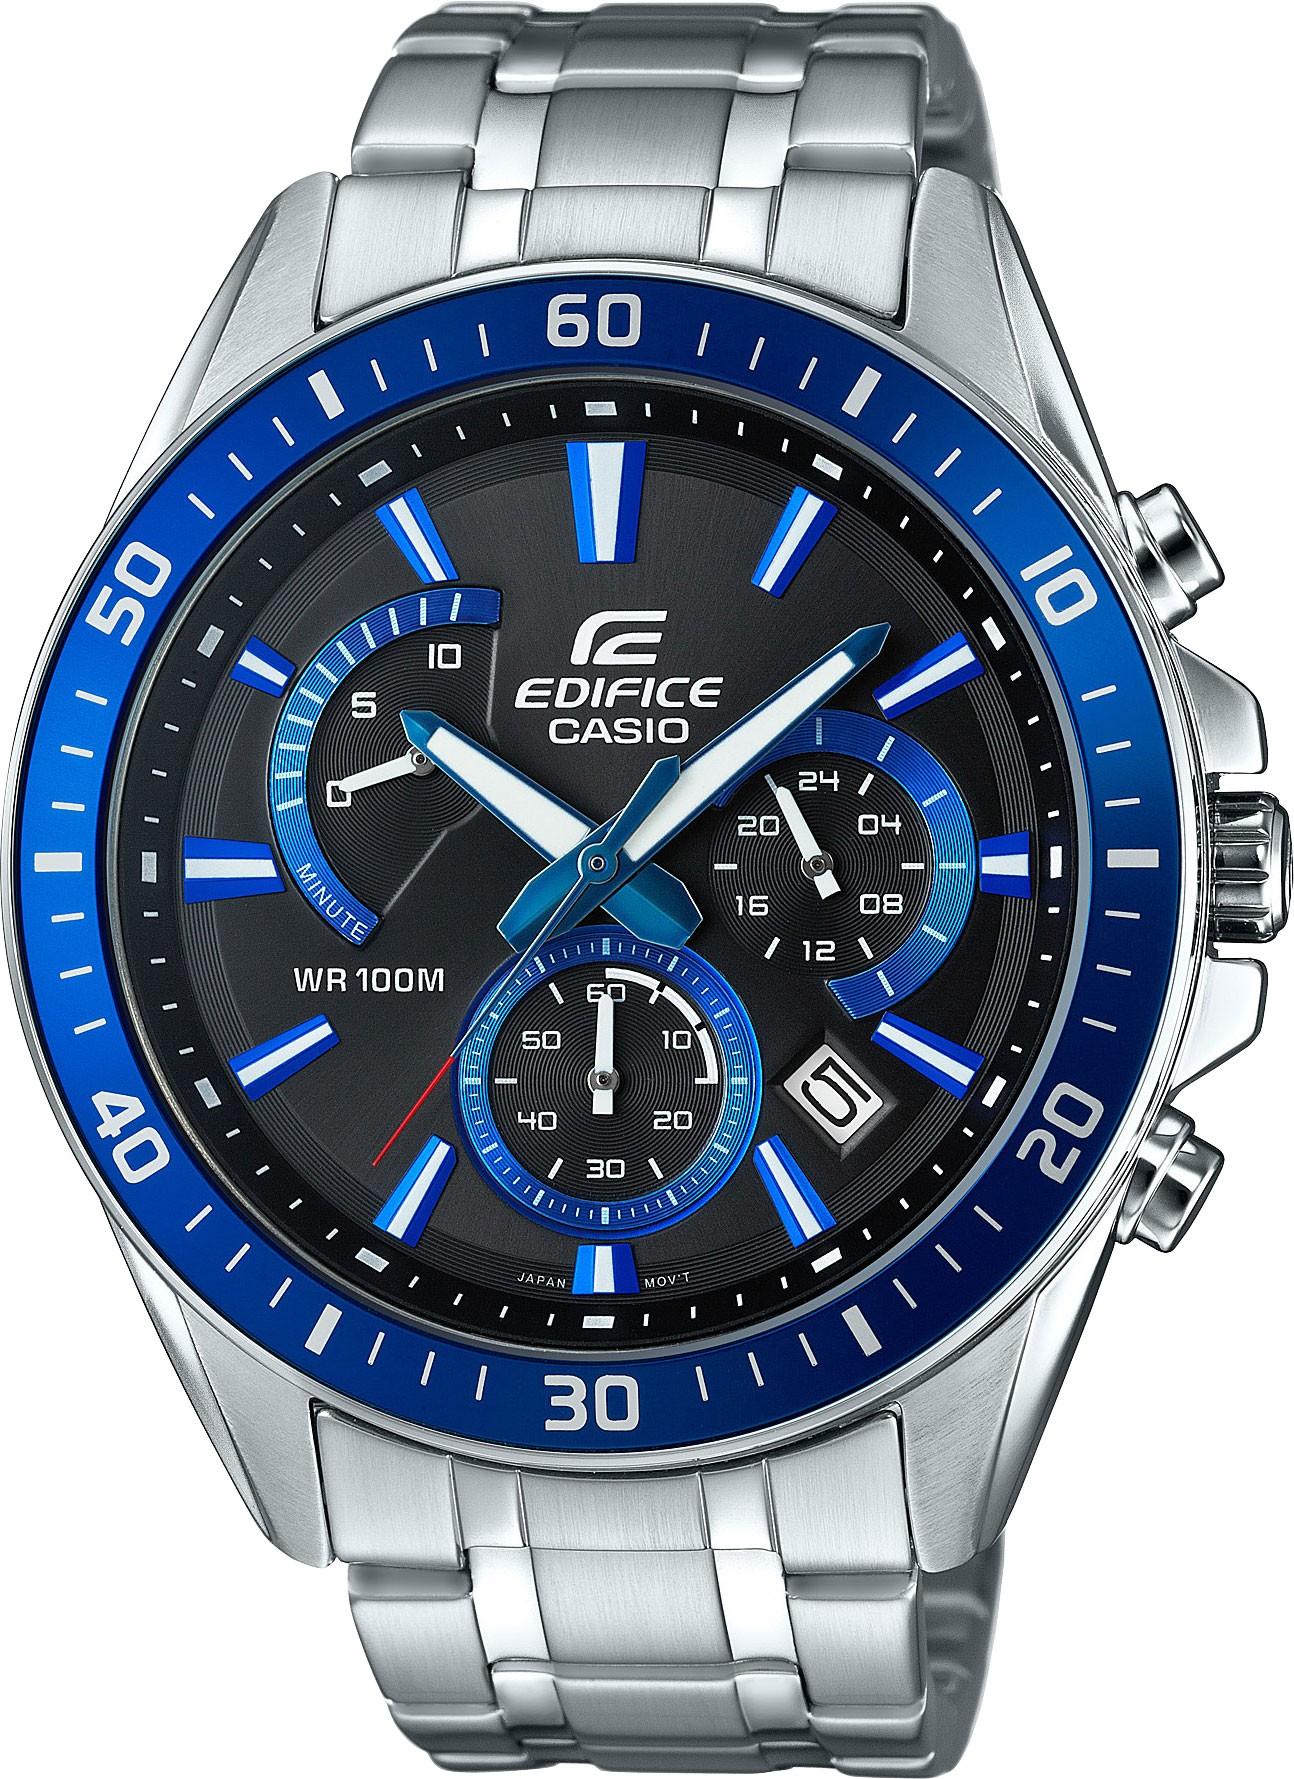 Мужские часы Casio Edifice EFR-552D-1A2VUEF